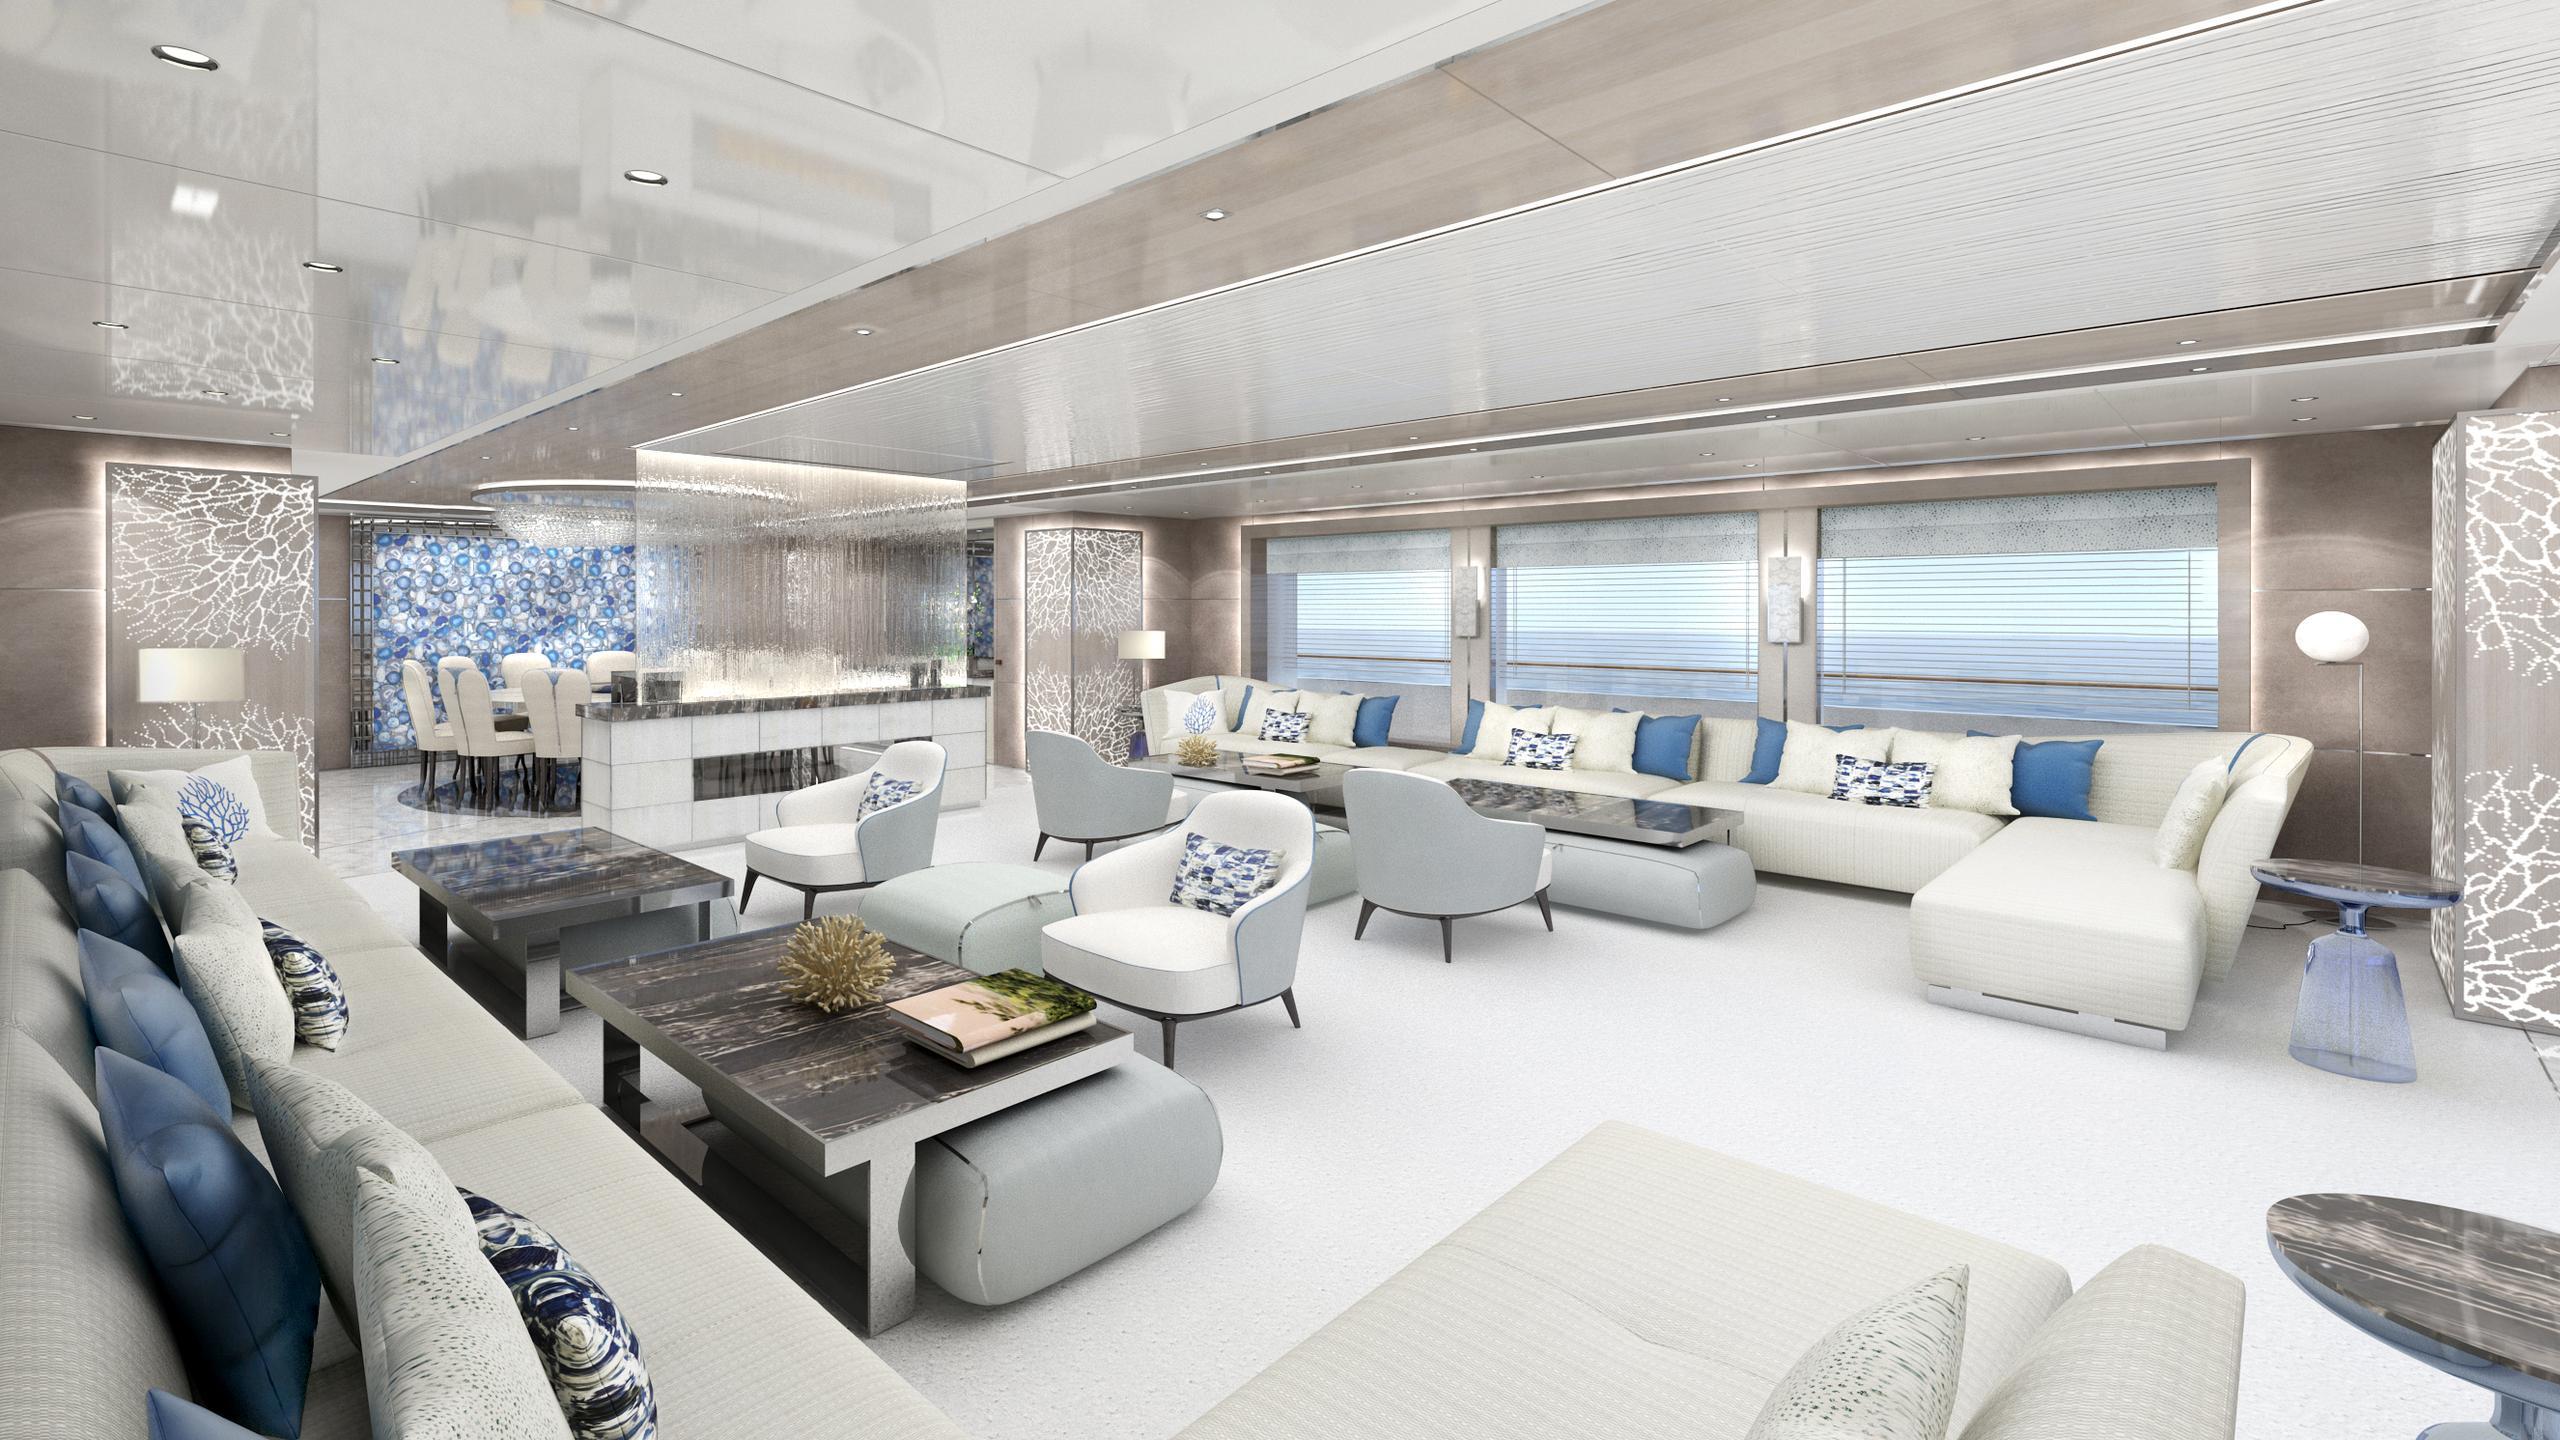 go motoryacht turquoise yachts nb63 77m 2018 rendering saloon